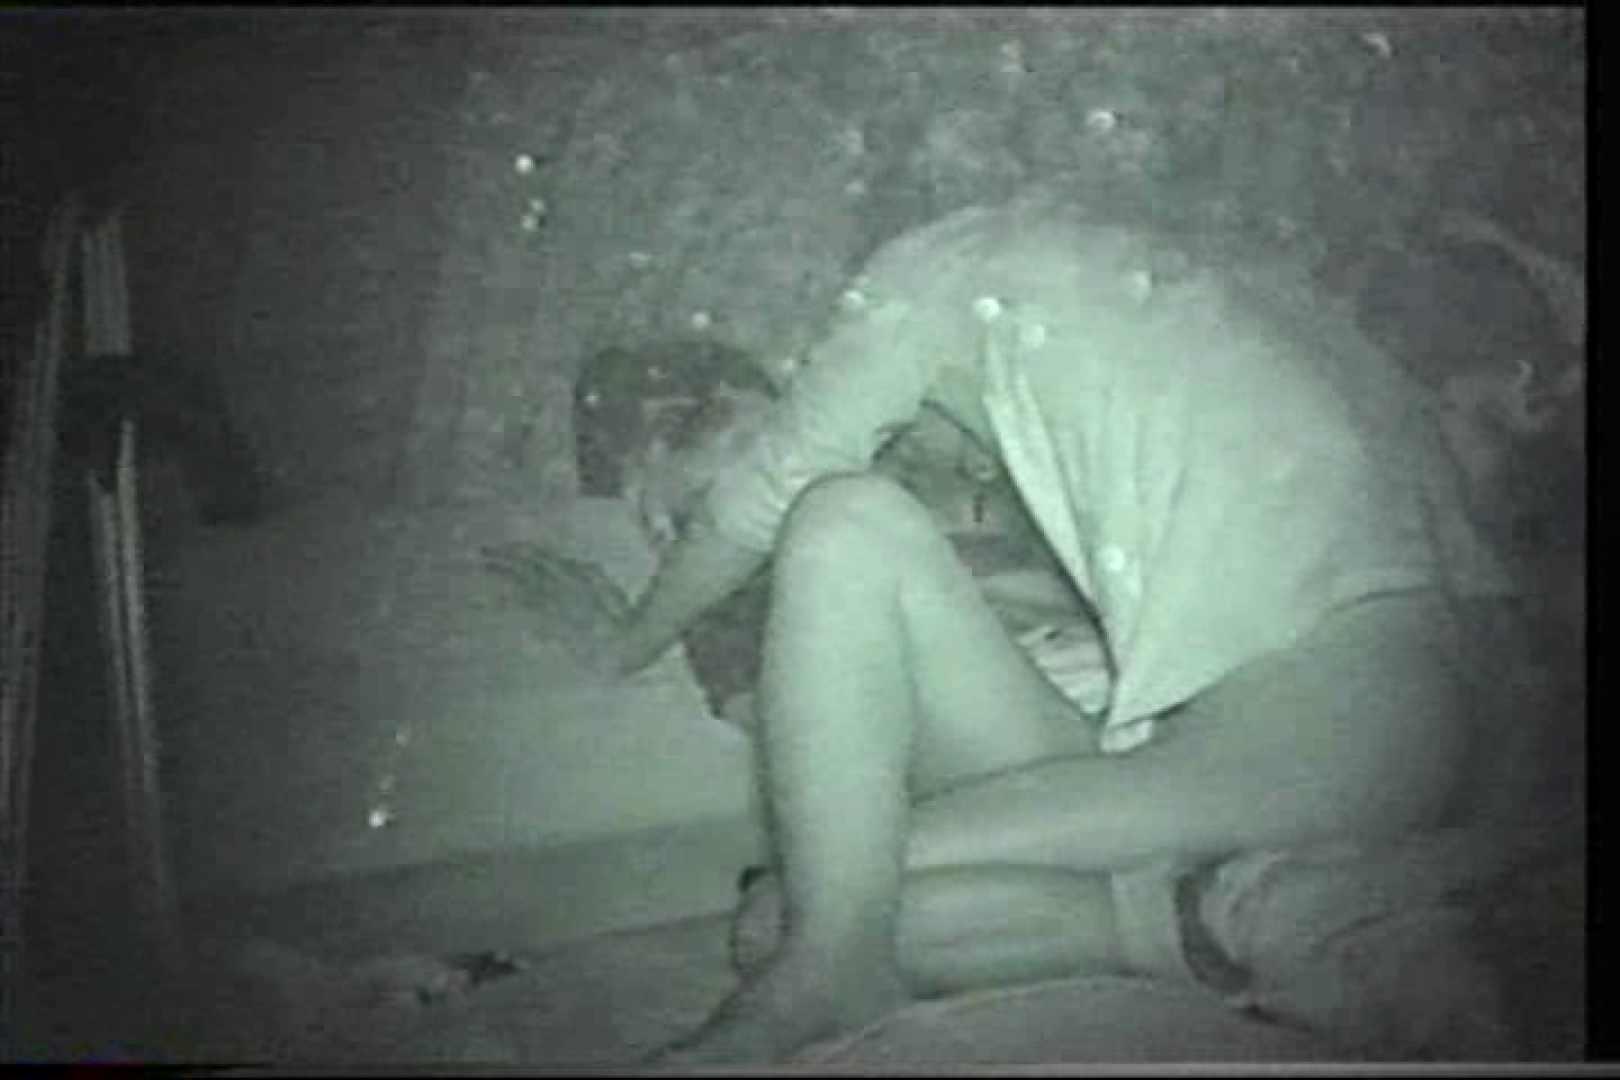 MASAさんの待ち伏せ撮り! 赤外線カーセックスVol.3 盗撮 ワレメ動画紹介 71pic 53